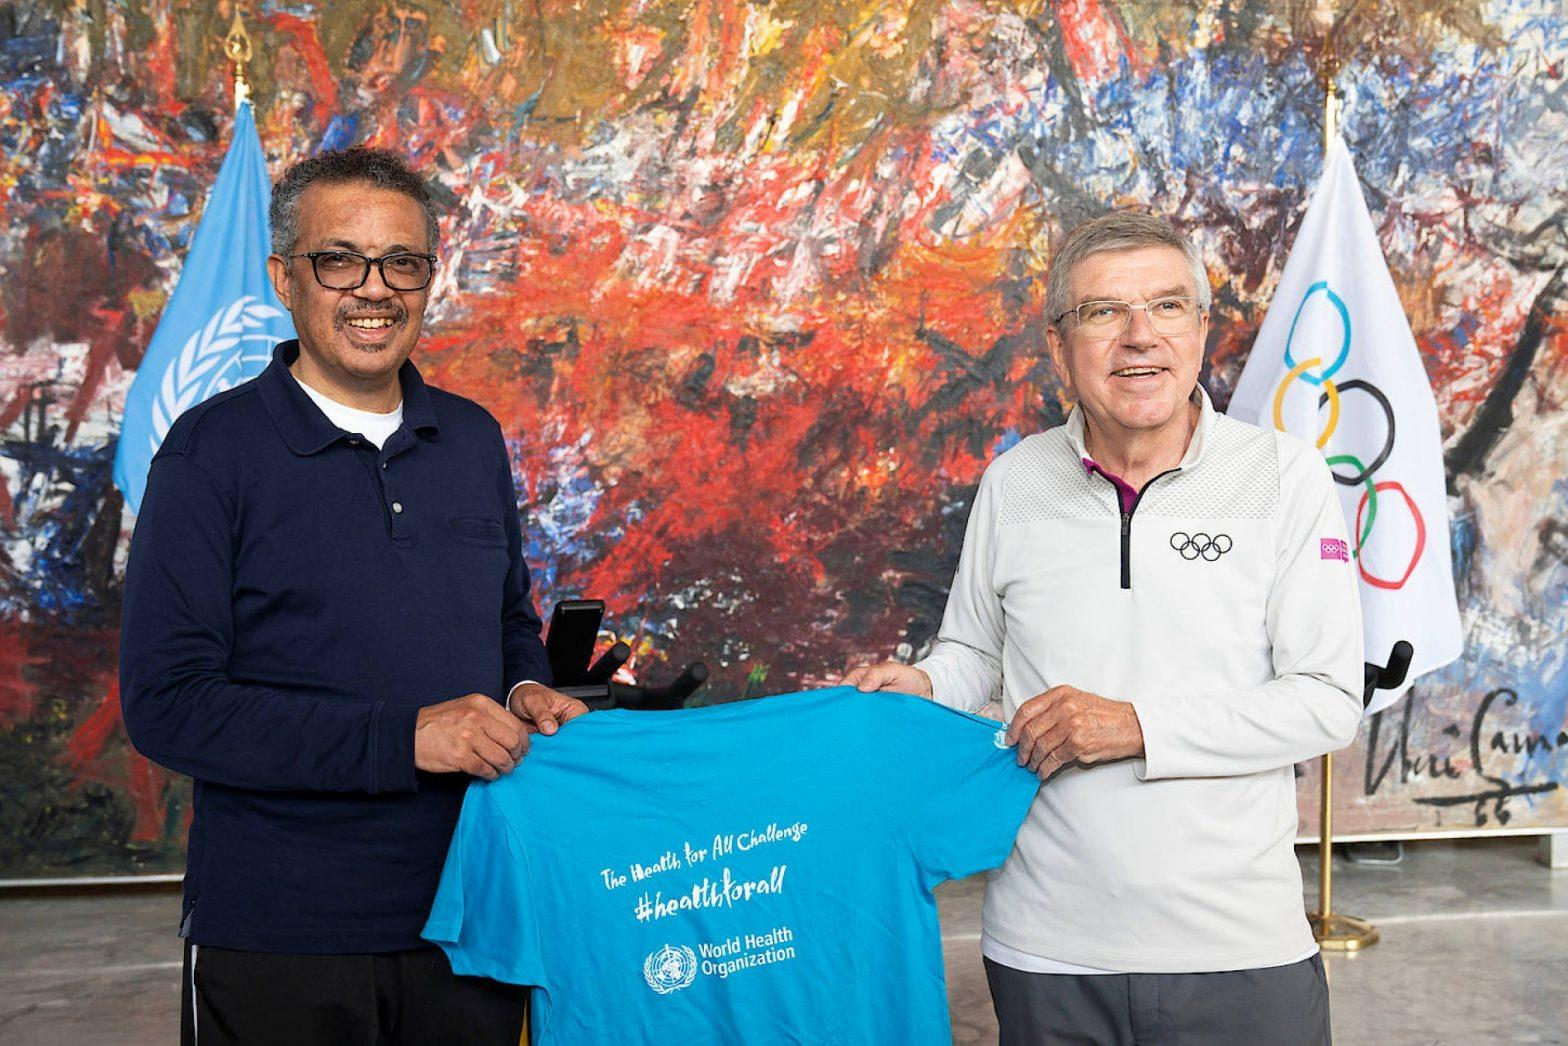 WHO & IOC team up to improve health through sport_40.1